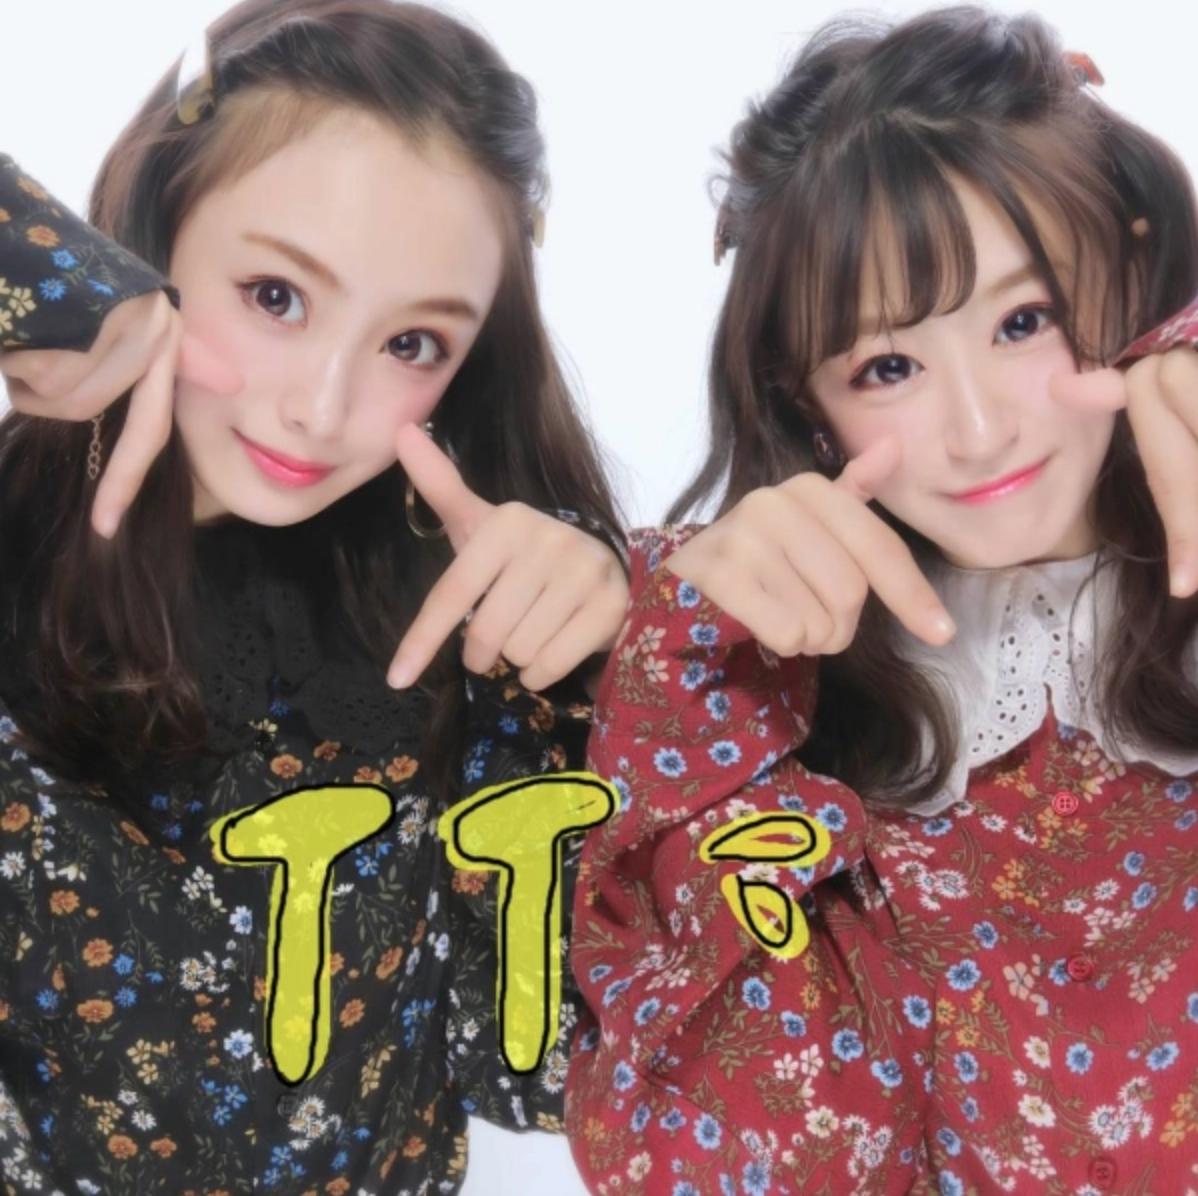 Japanese Purikura Poses - TT Pose